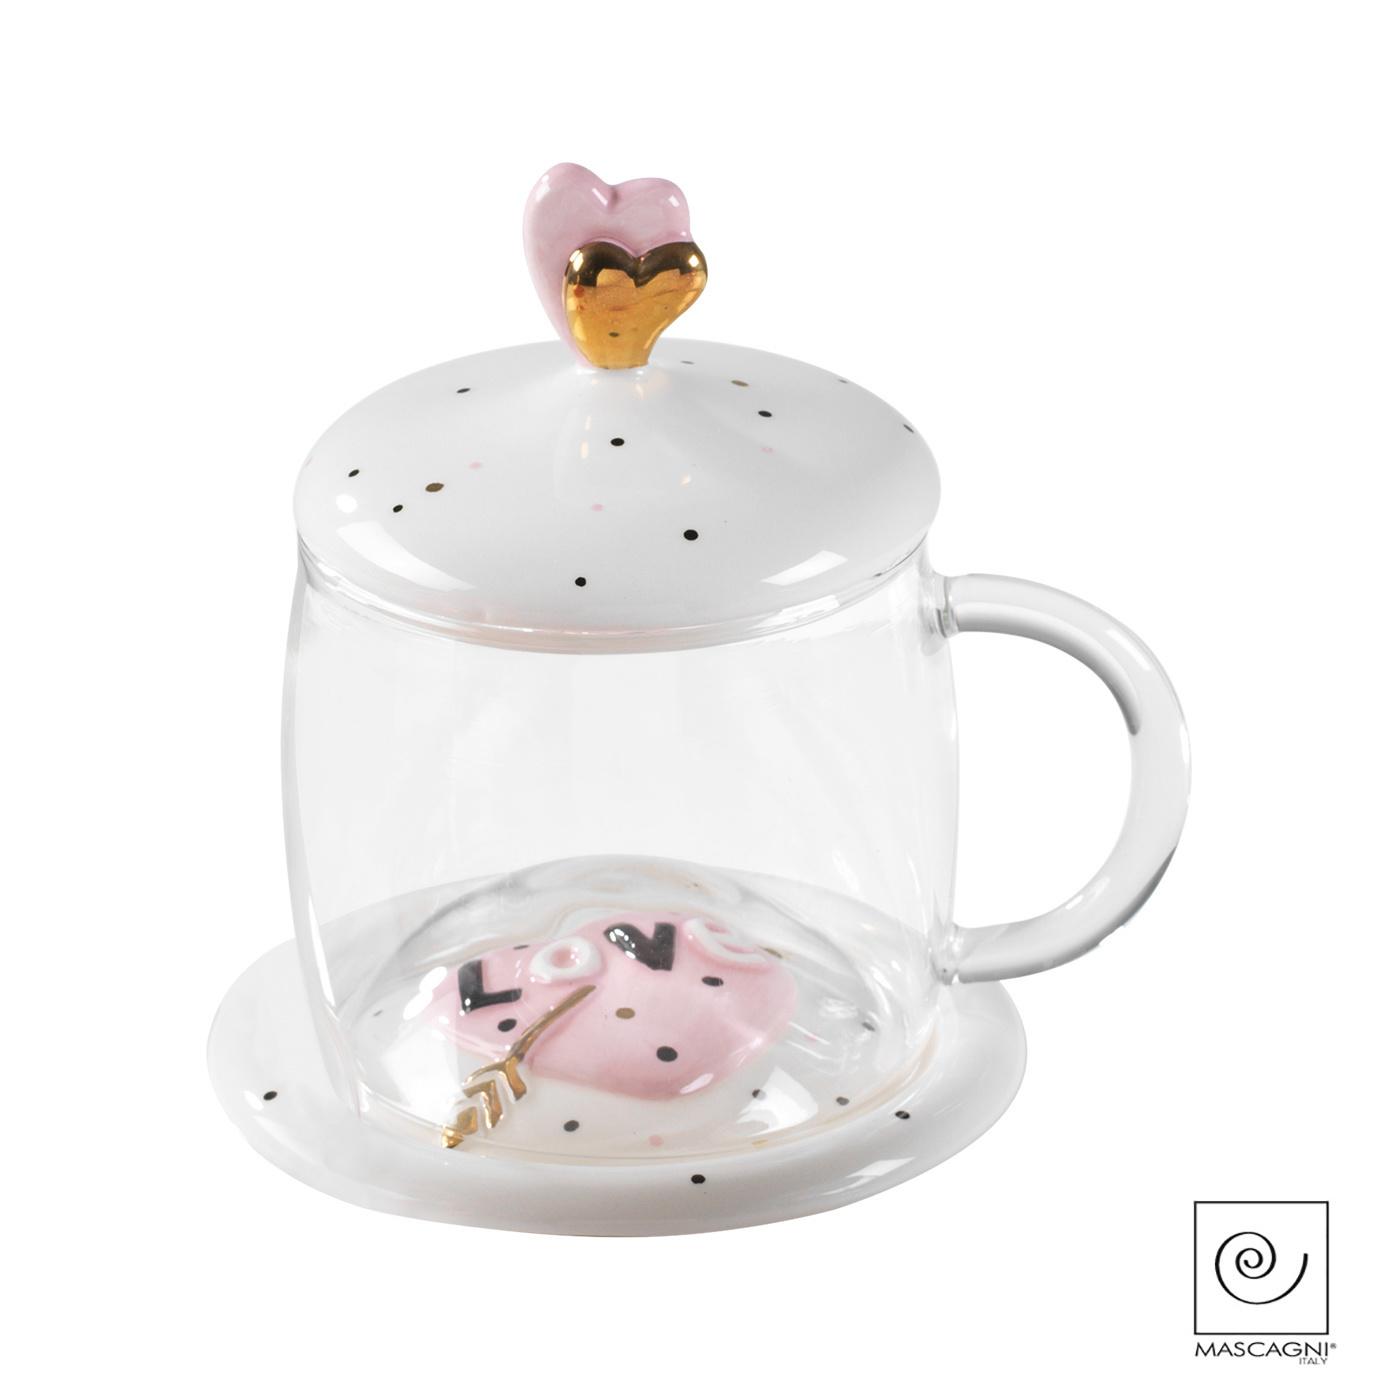 Art Mascagni A1025 TEA SET